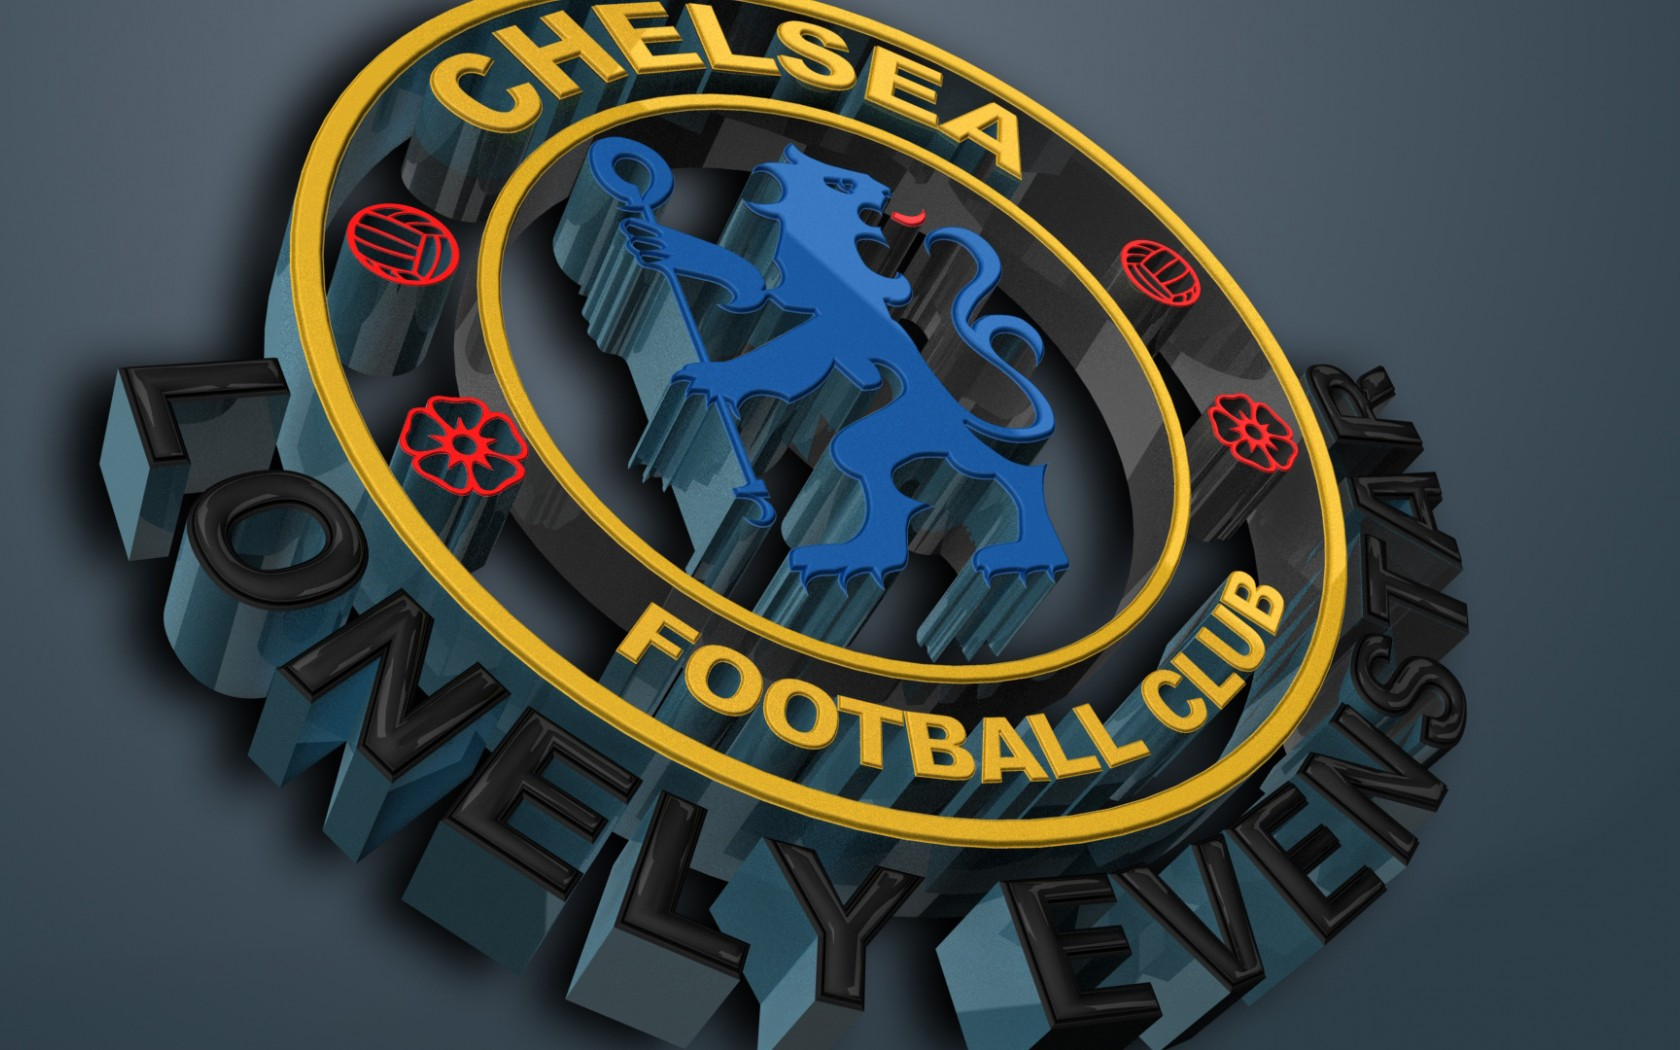 Chelsea fc images 3d hd desktop wallpapers 4k hd - Chelsea wallpaper 4k ...